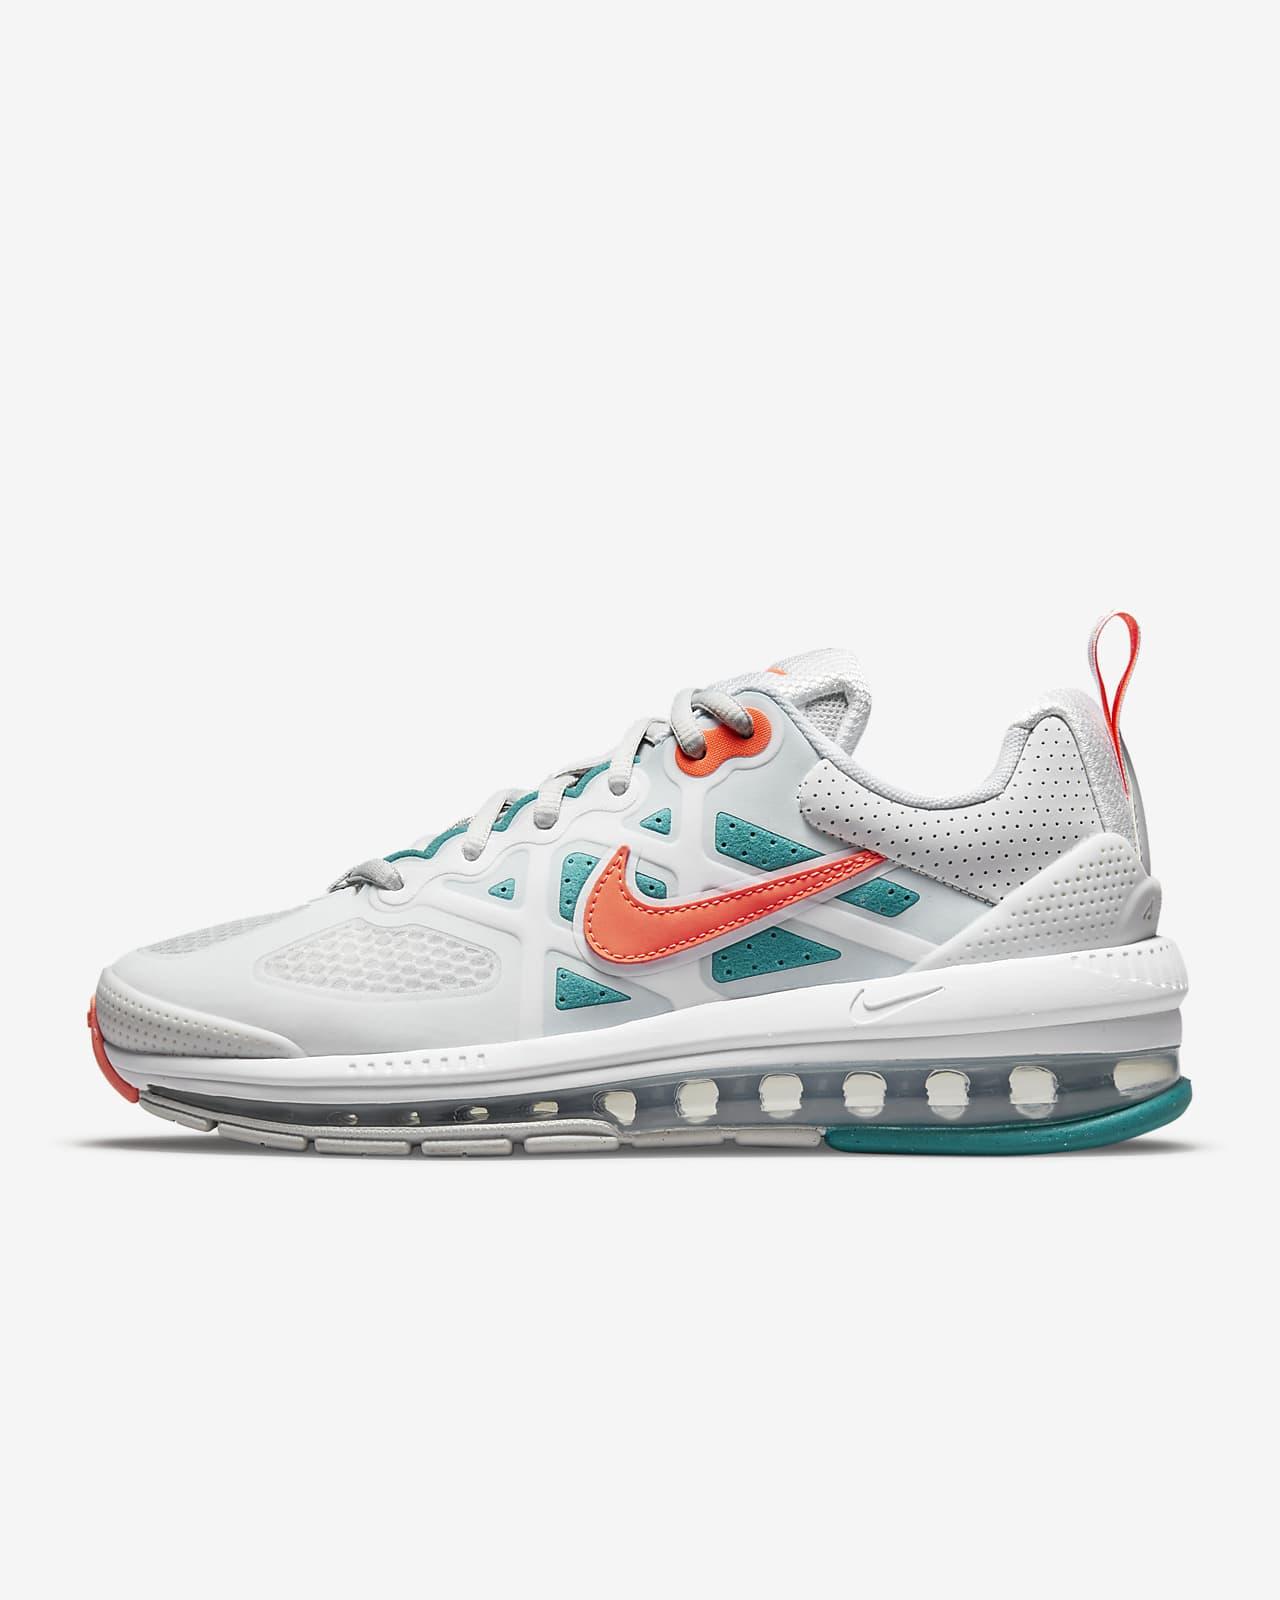 Nike Air Max Genome Women's Shoe. Nike LU